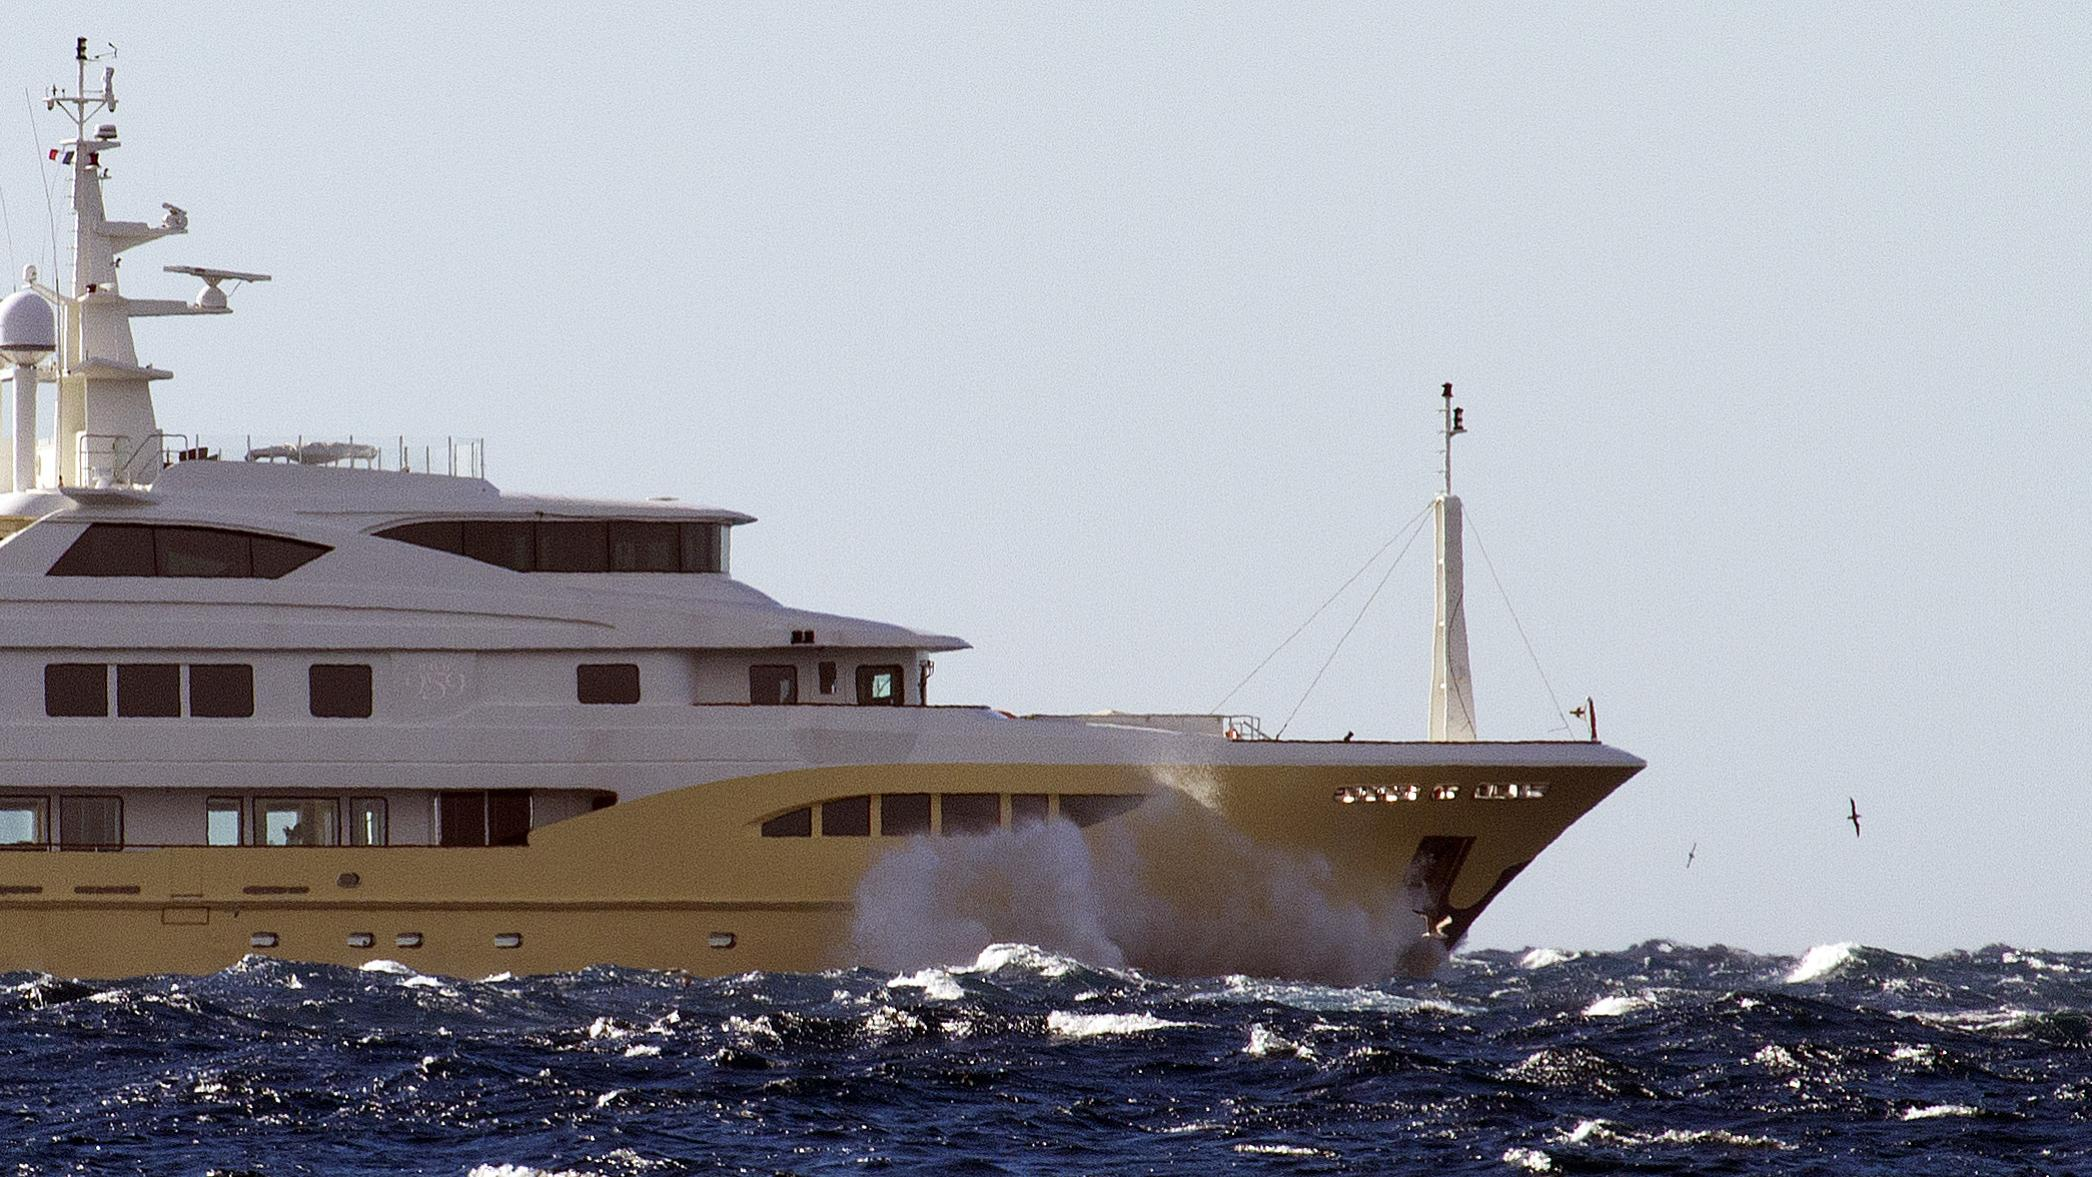 jade-959-bandido-170-explorer-yacht-2014-52m-running-bow-details